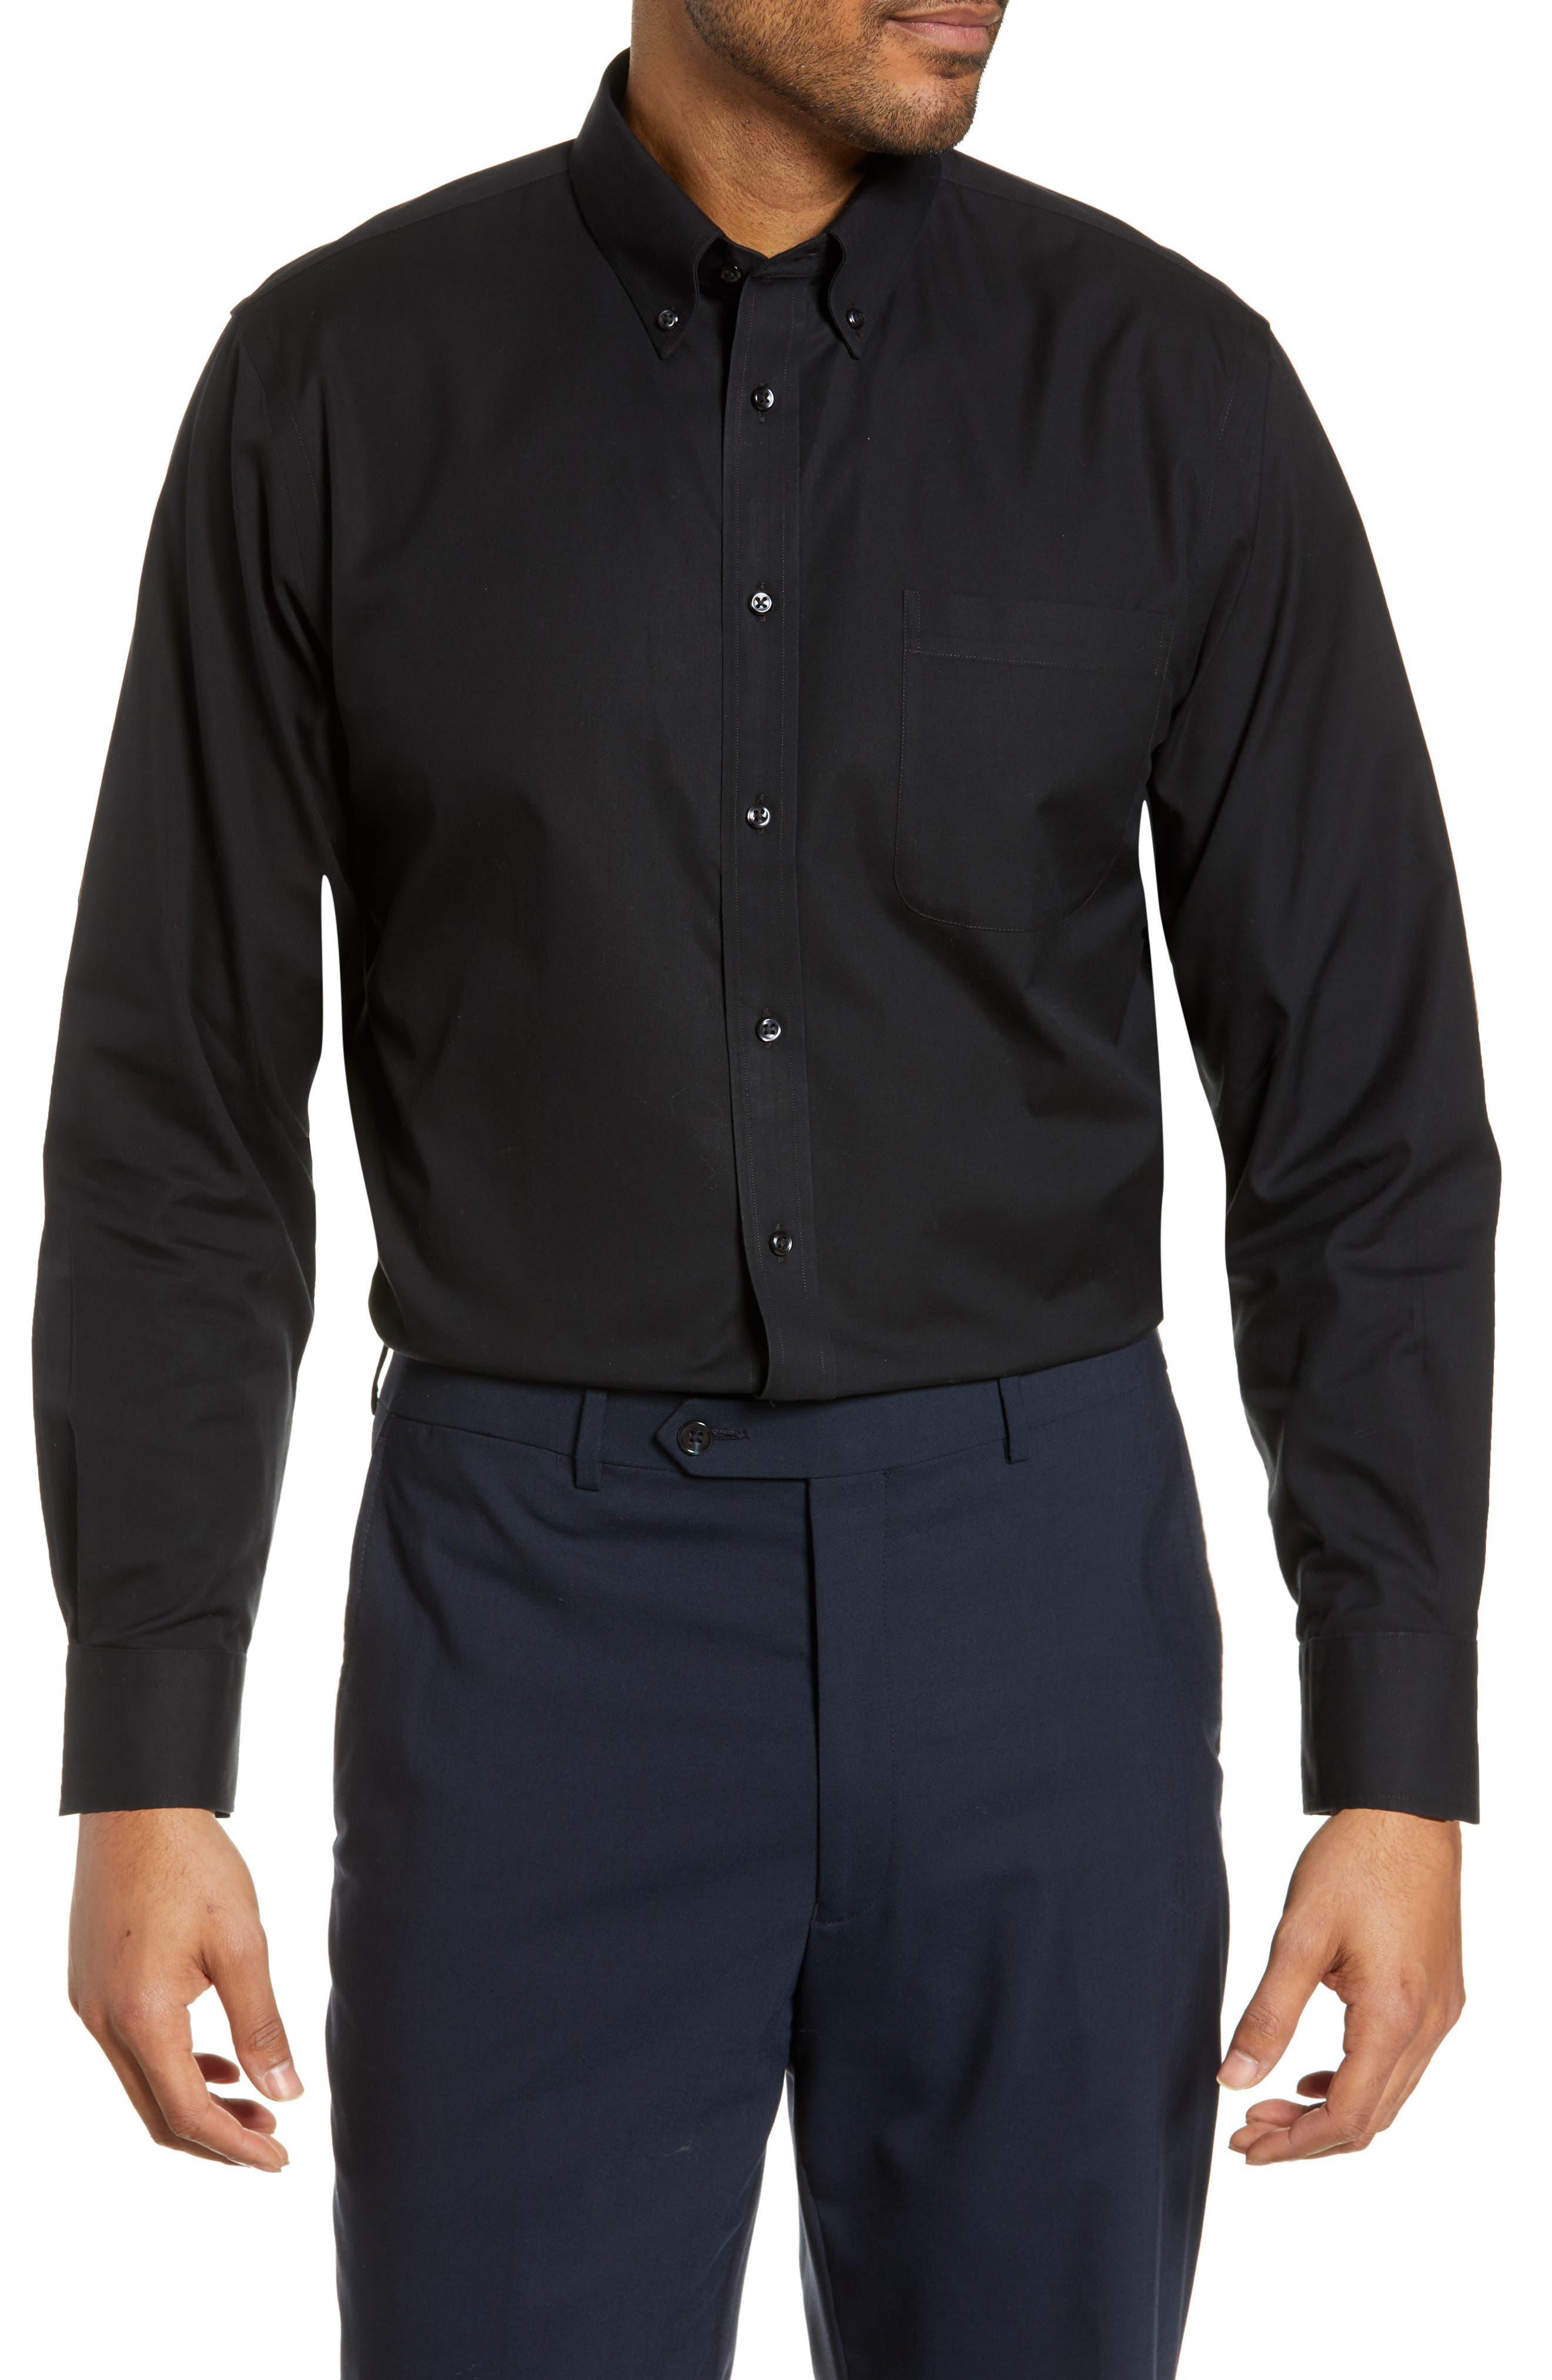 Nordstrom Shop Smartcare(TM) Traditional Fit Pinpoint Dress Shirt - Black